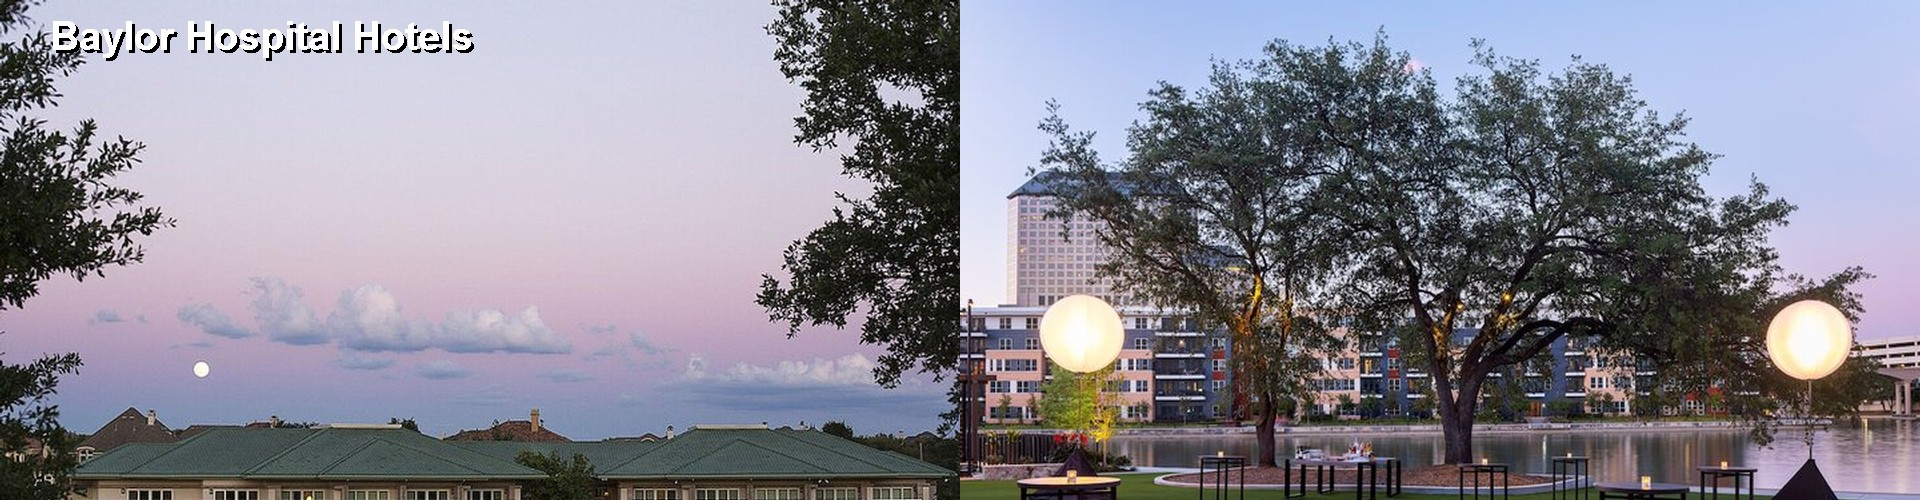 5 Best Hotels Near Baylor Hospital